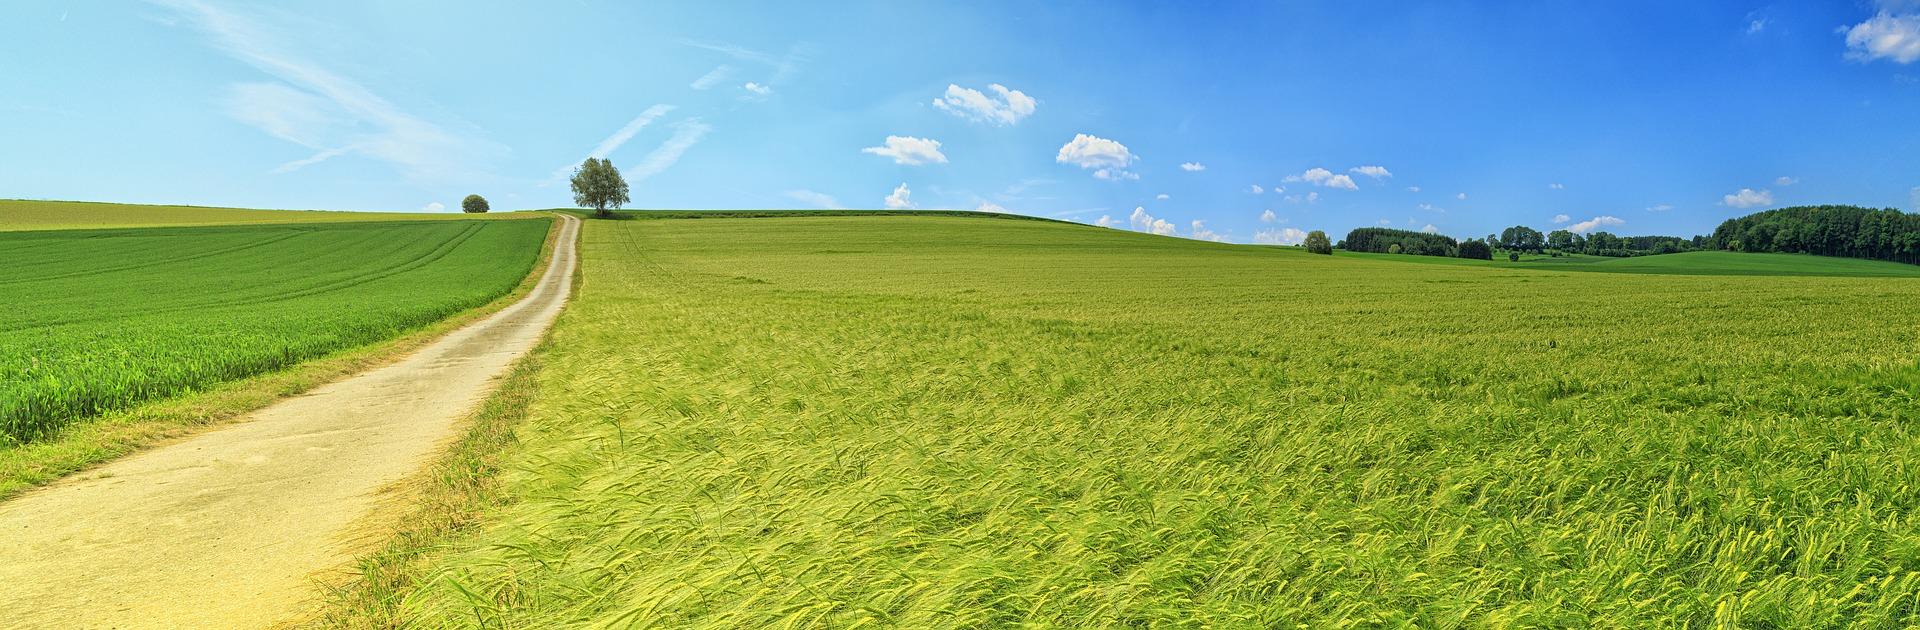 Farmland leading to the horizon.jpg